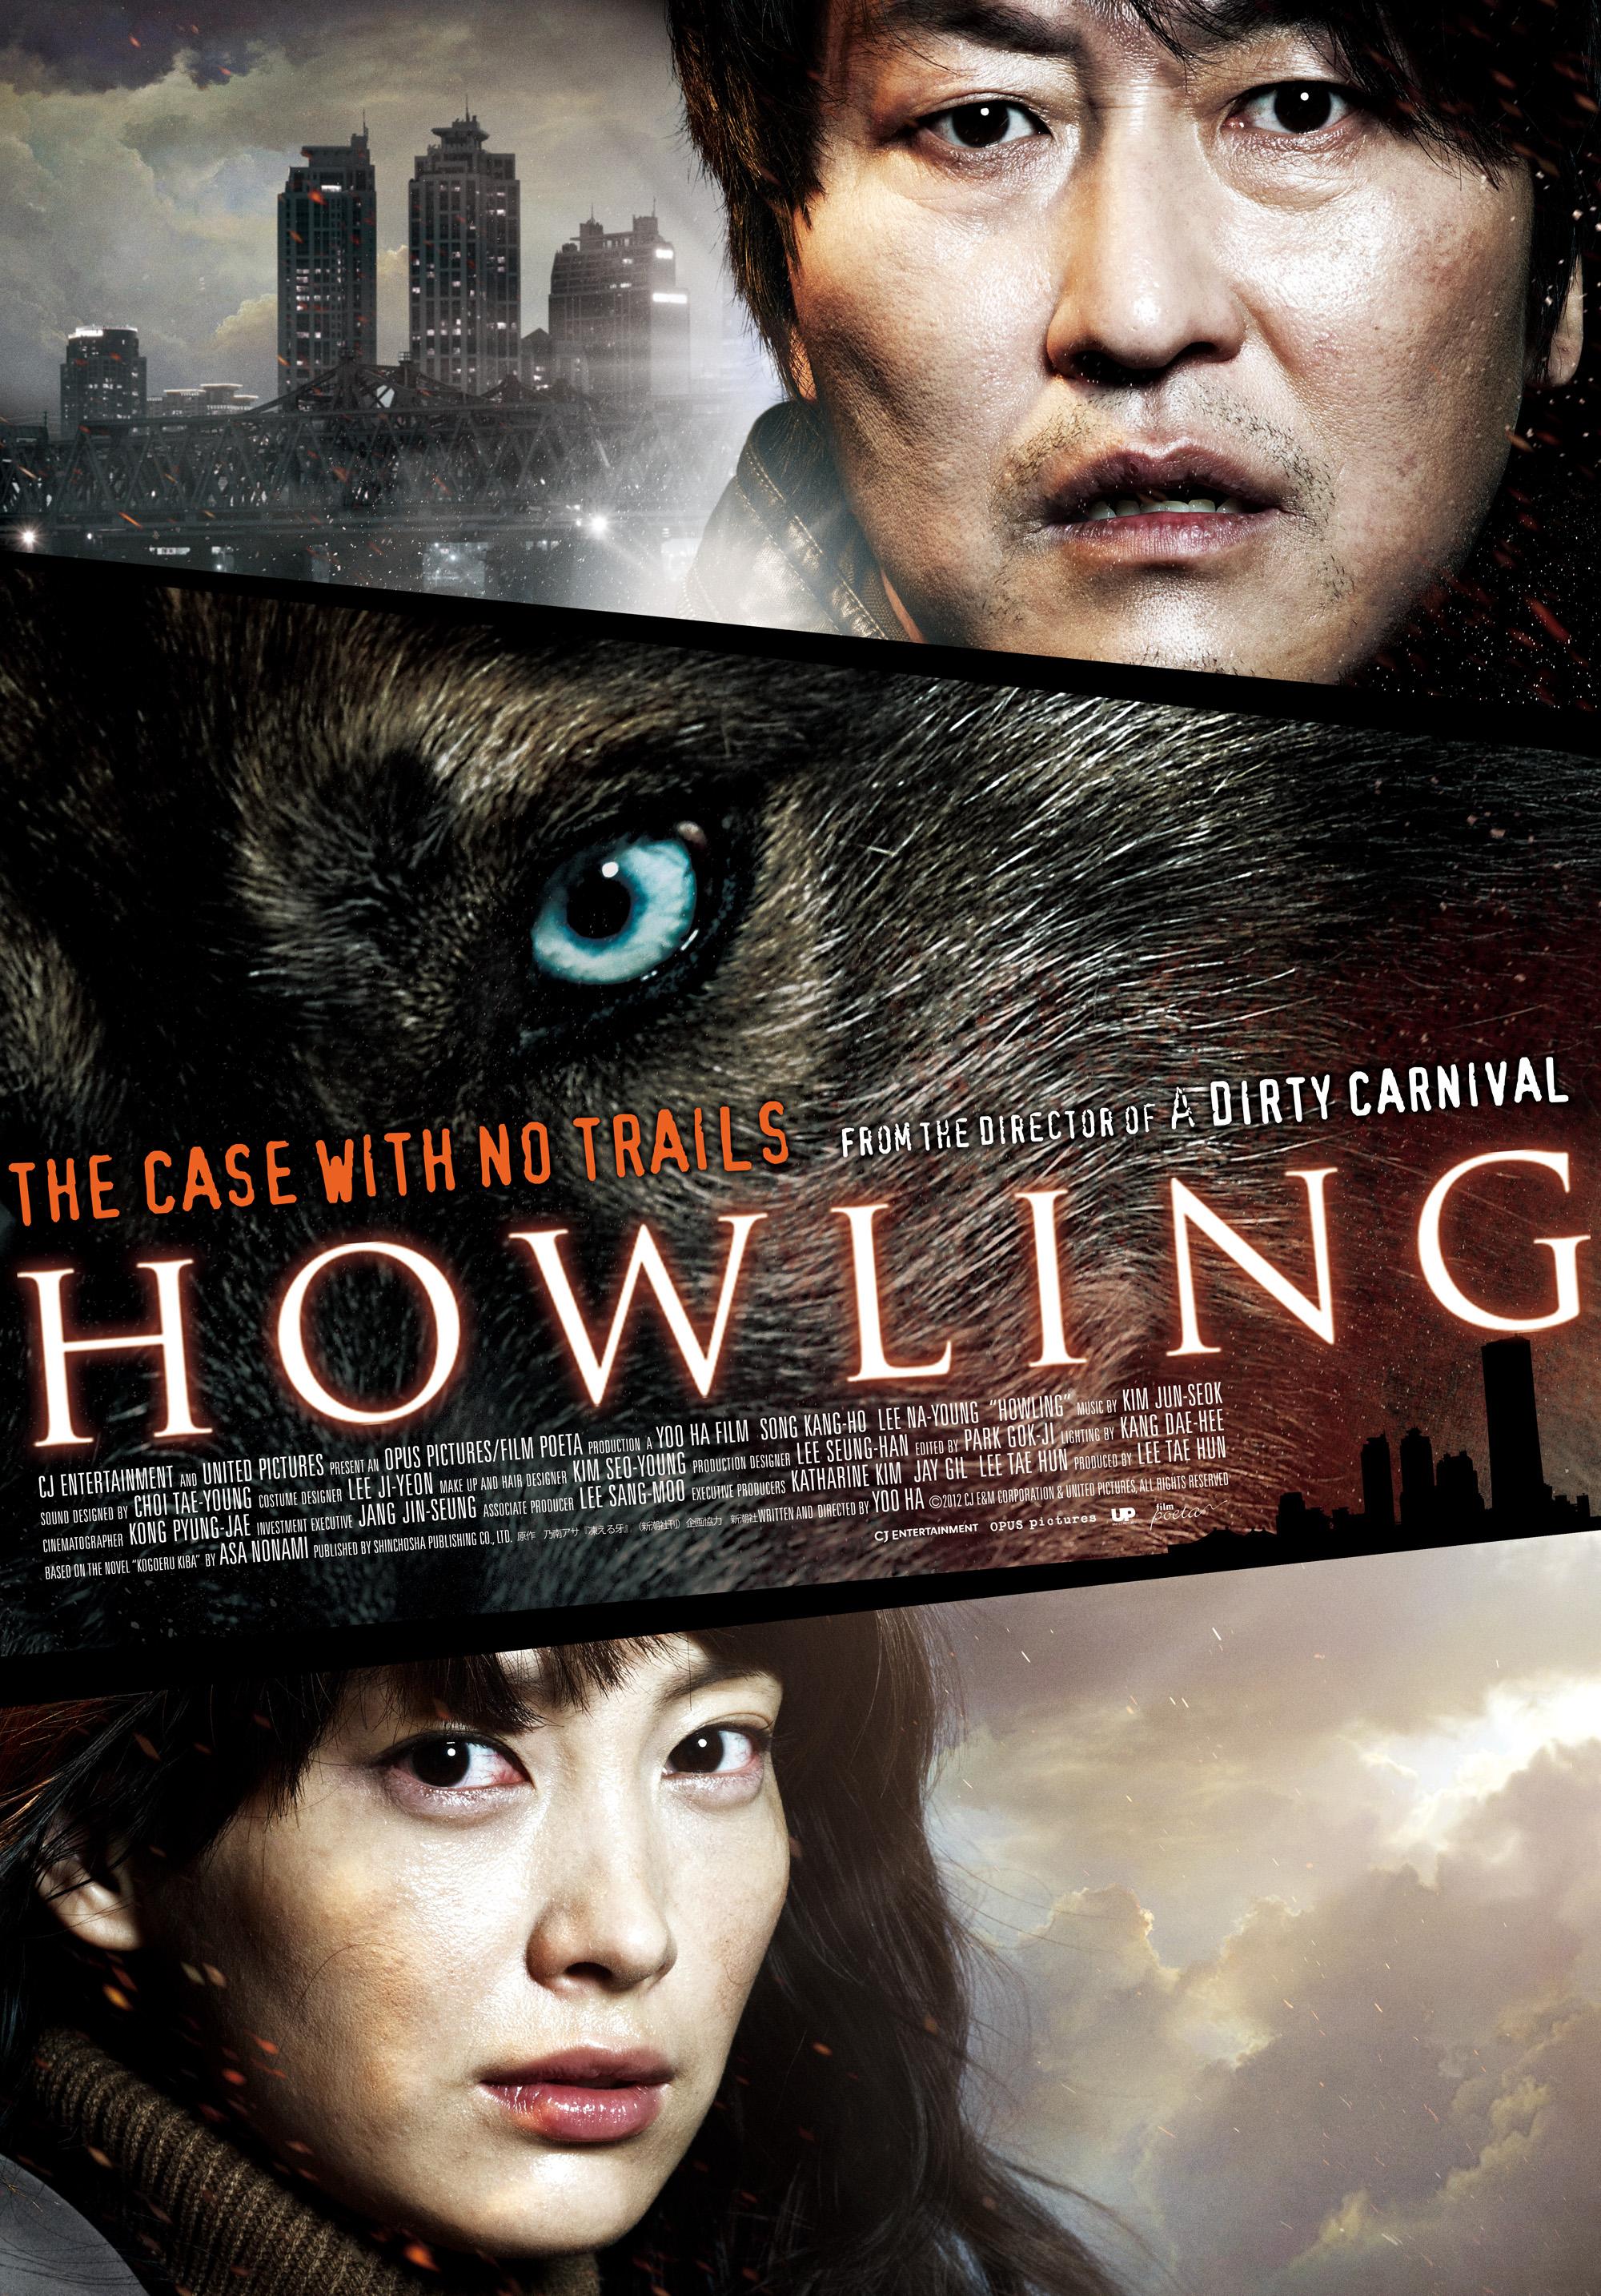 Howling [ซับไทย]